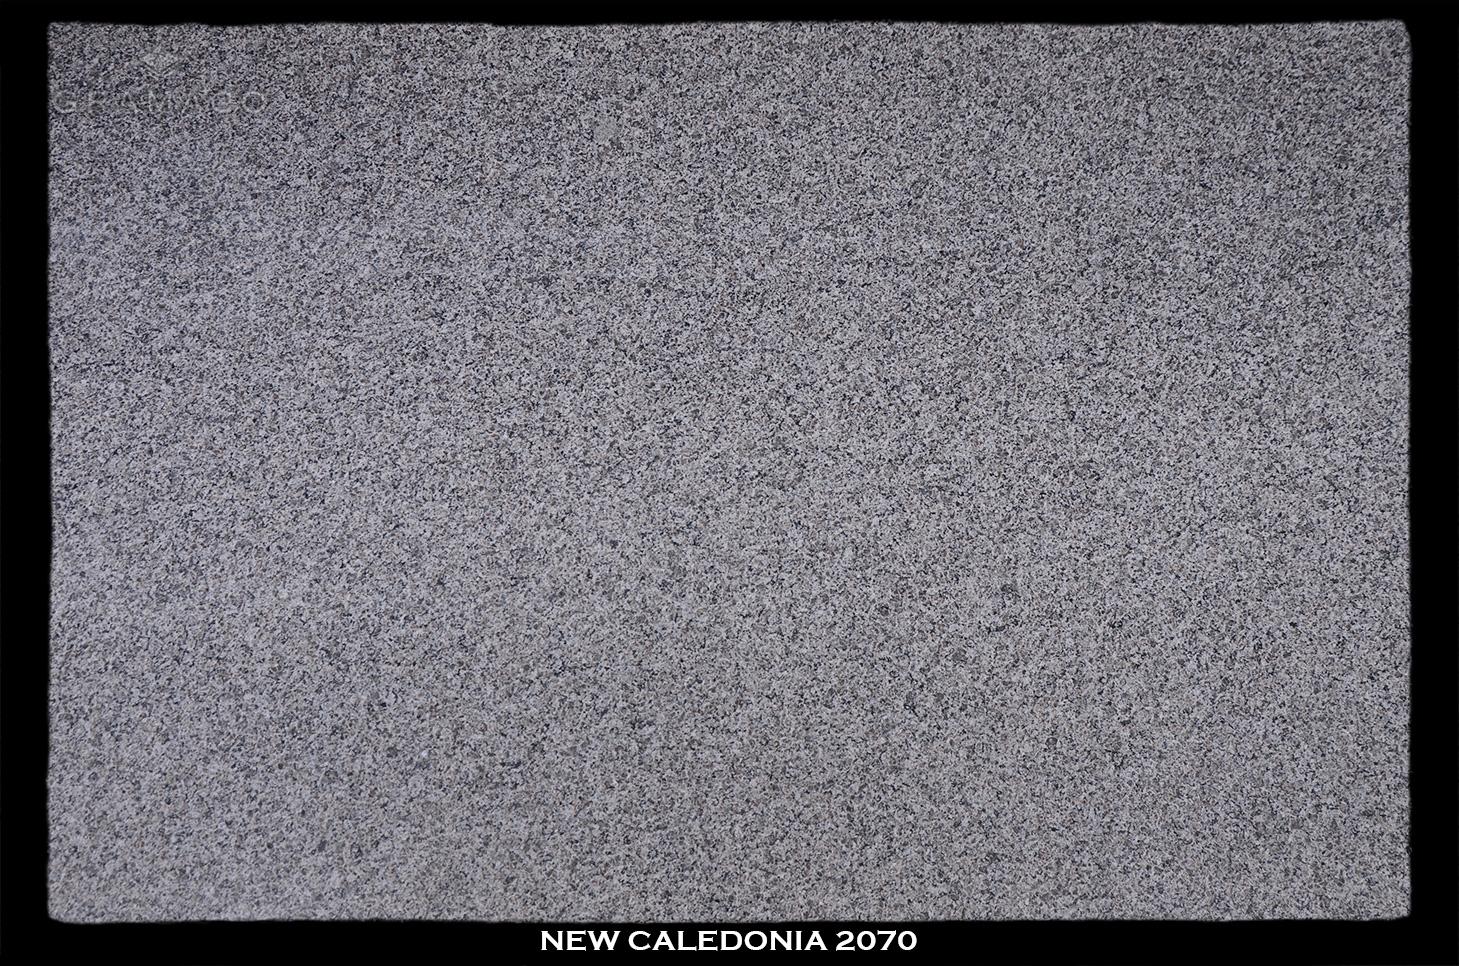 NEW-CALEDONIA-2070